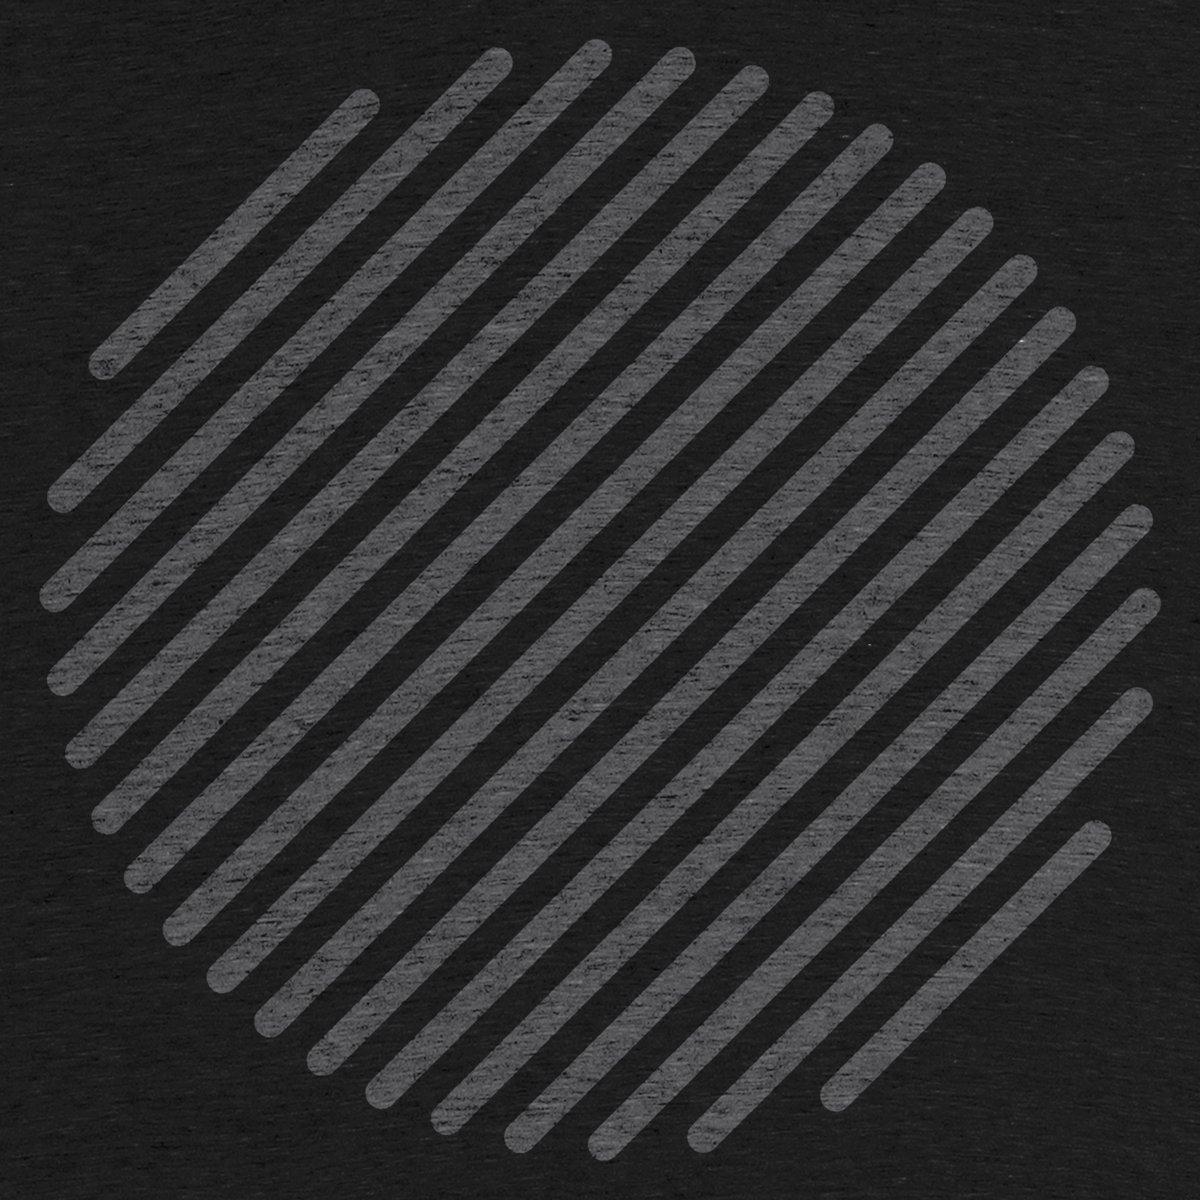 Cotton Bureau On Twitter Now That Matblackstudio S Designs Are On